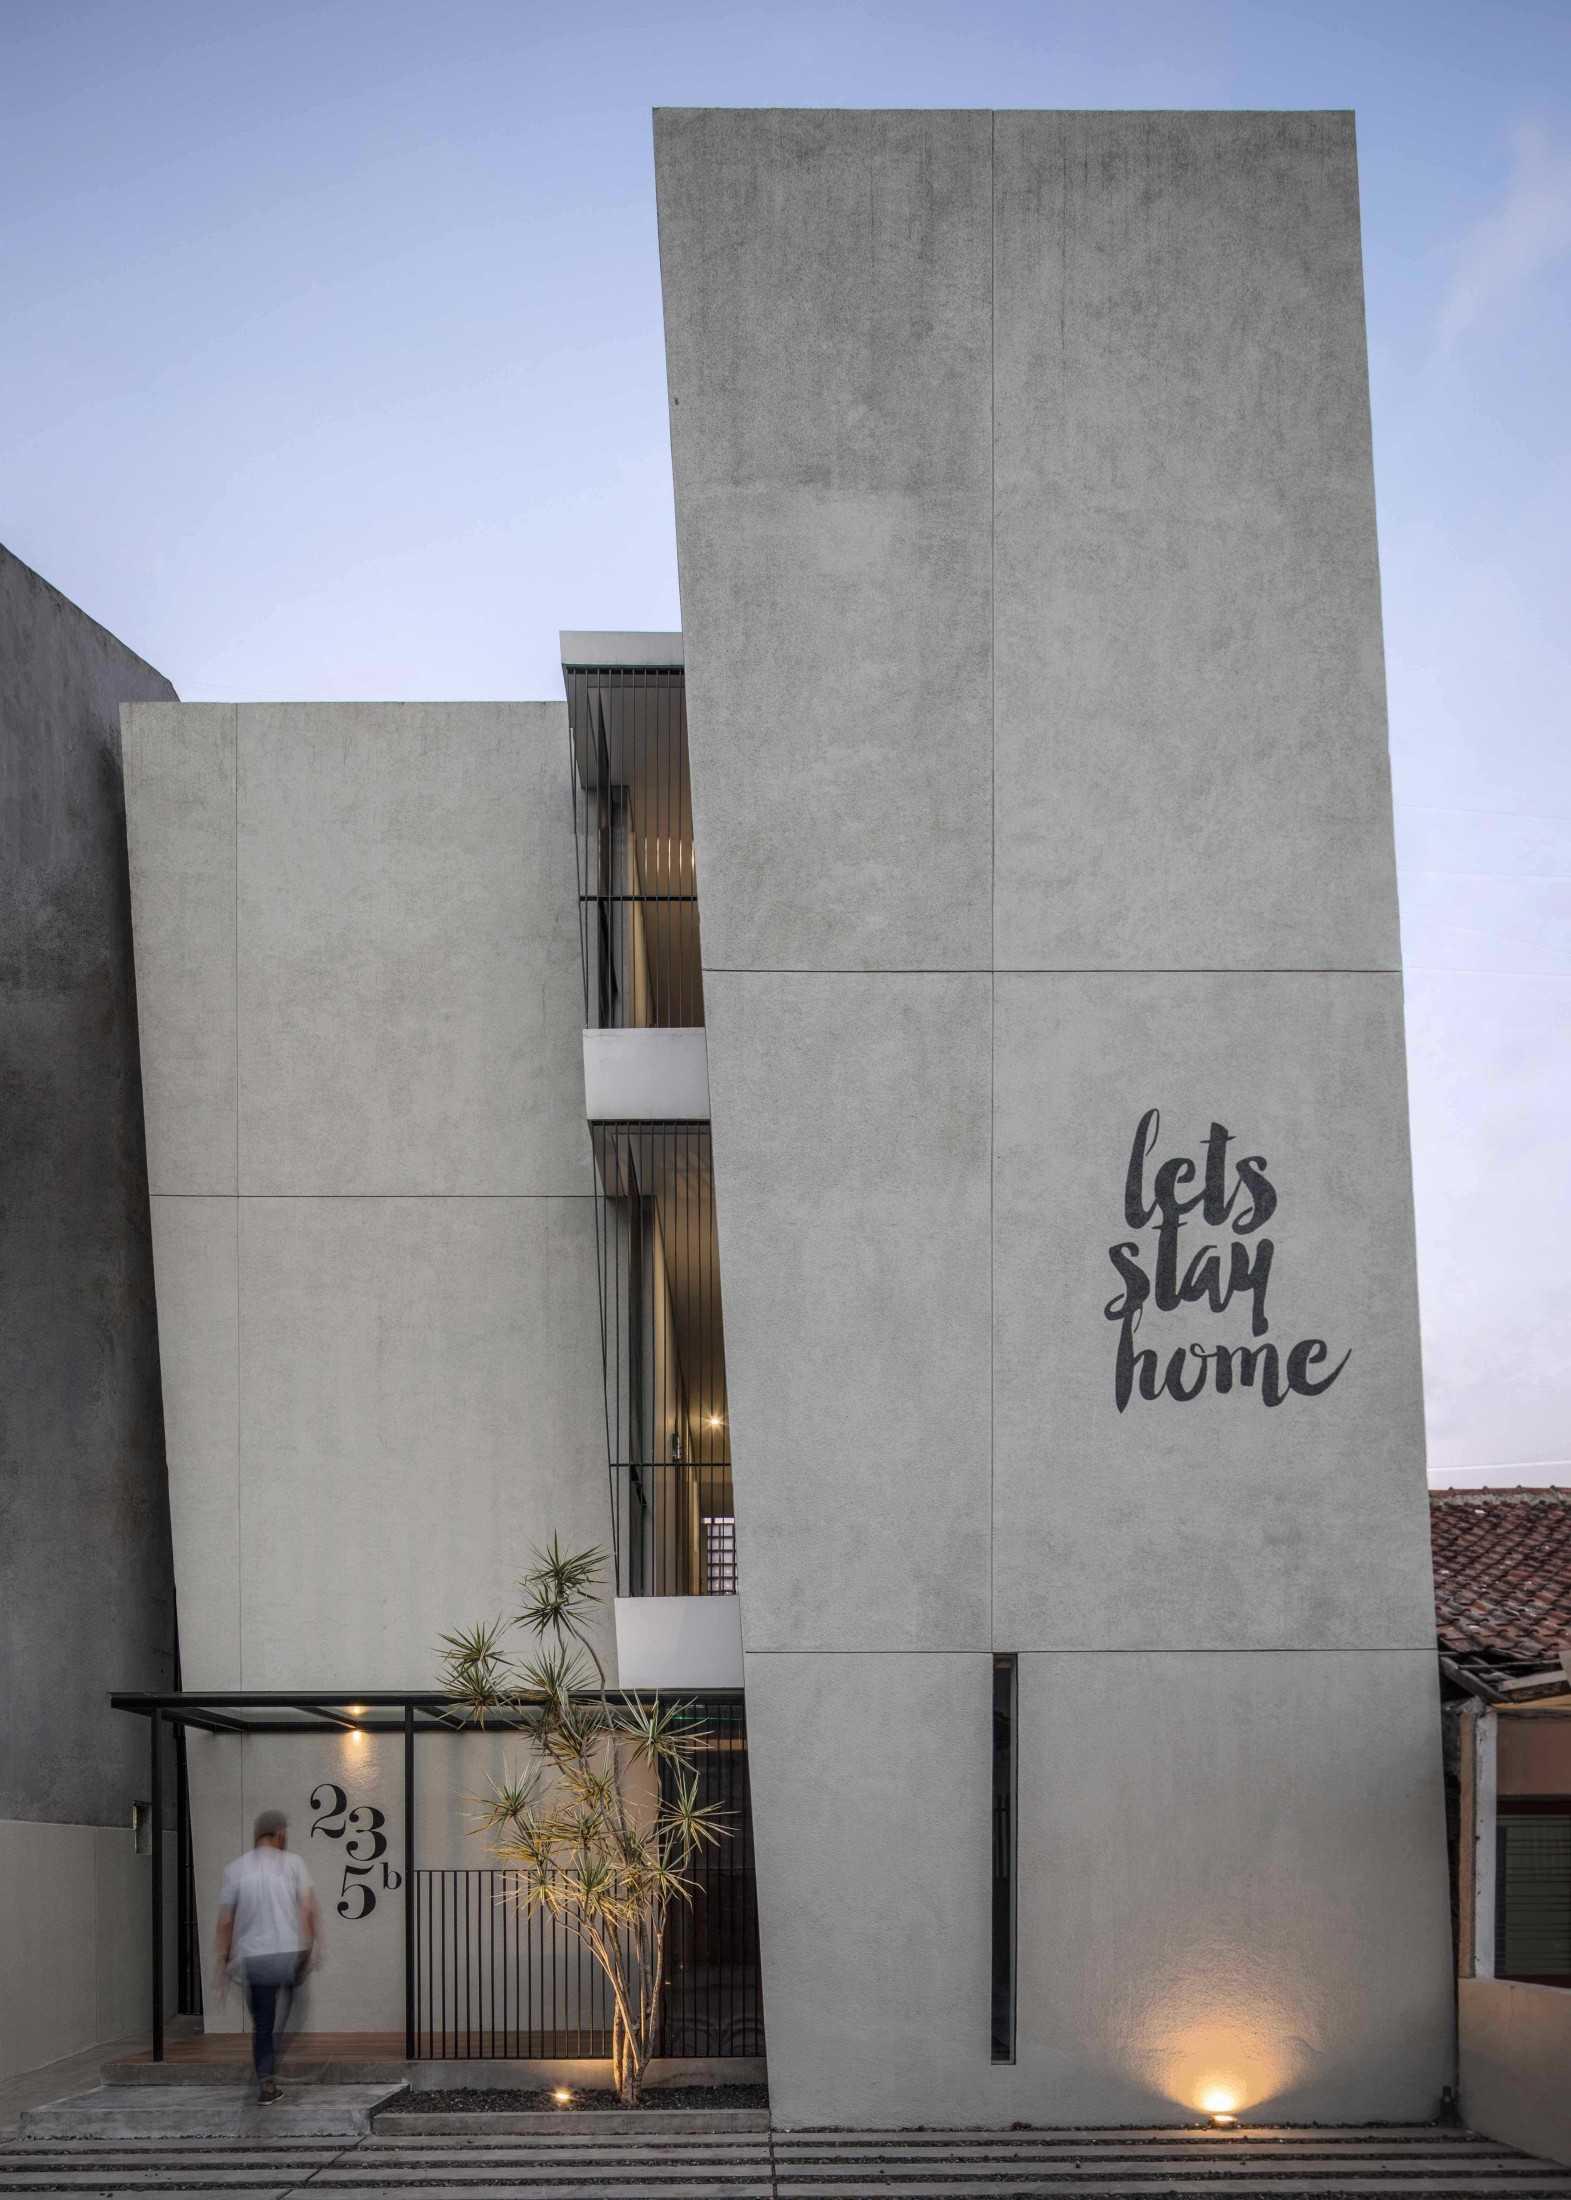 Rdma Lim Boarding House Pungkur, Kec. Regol, Kota Bandung, Jawa Barat, Indonesia Pungkur, Kec. Regol, Kota Bandung, Jawa Barat, Indonesia Rdma-Lim-Boarding-House  107677